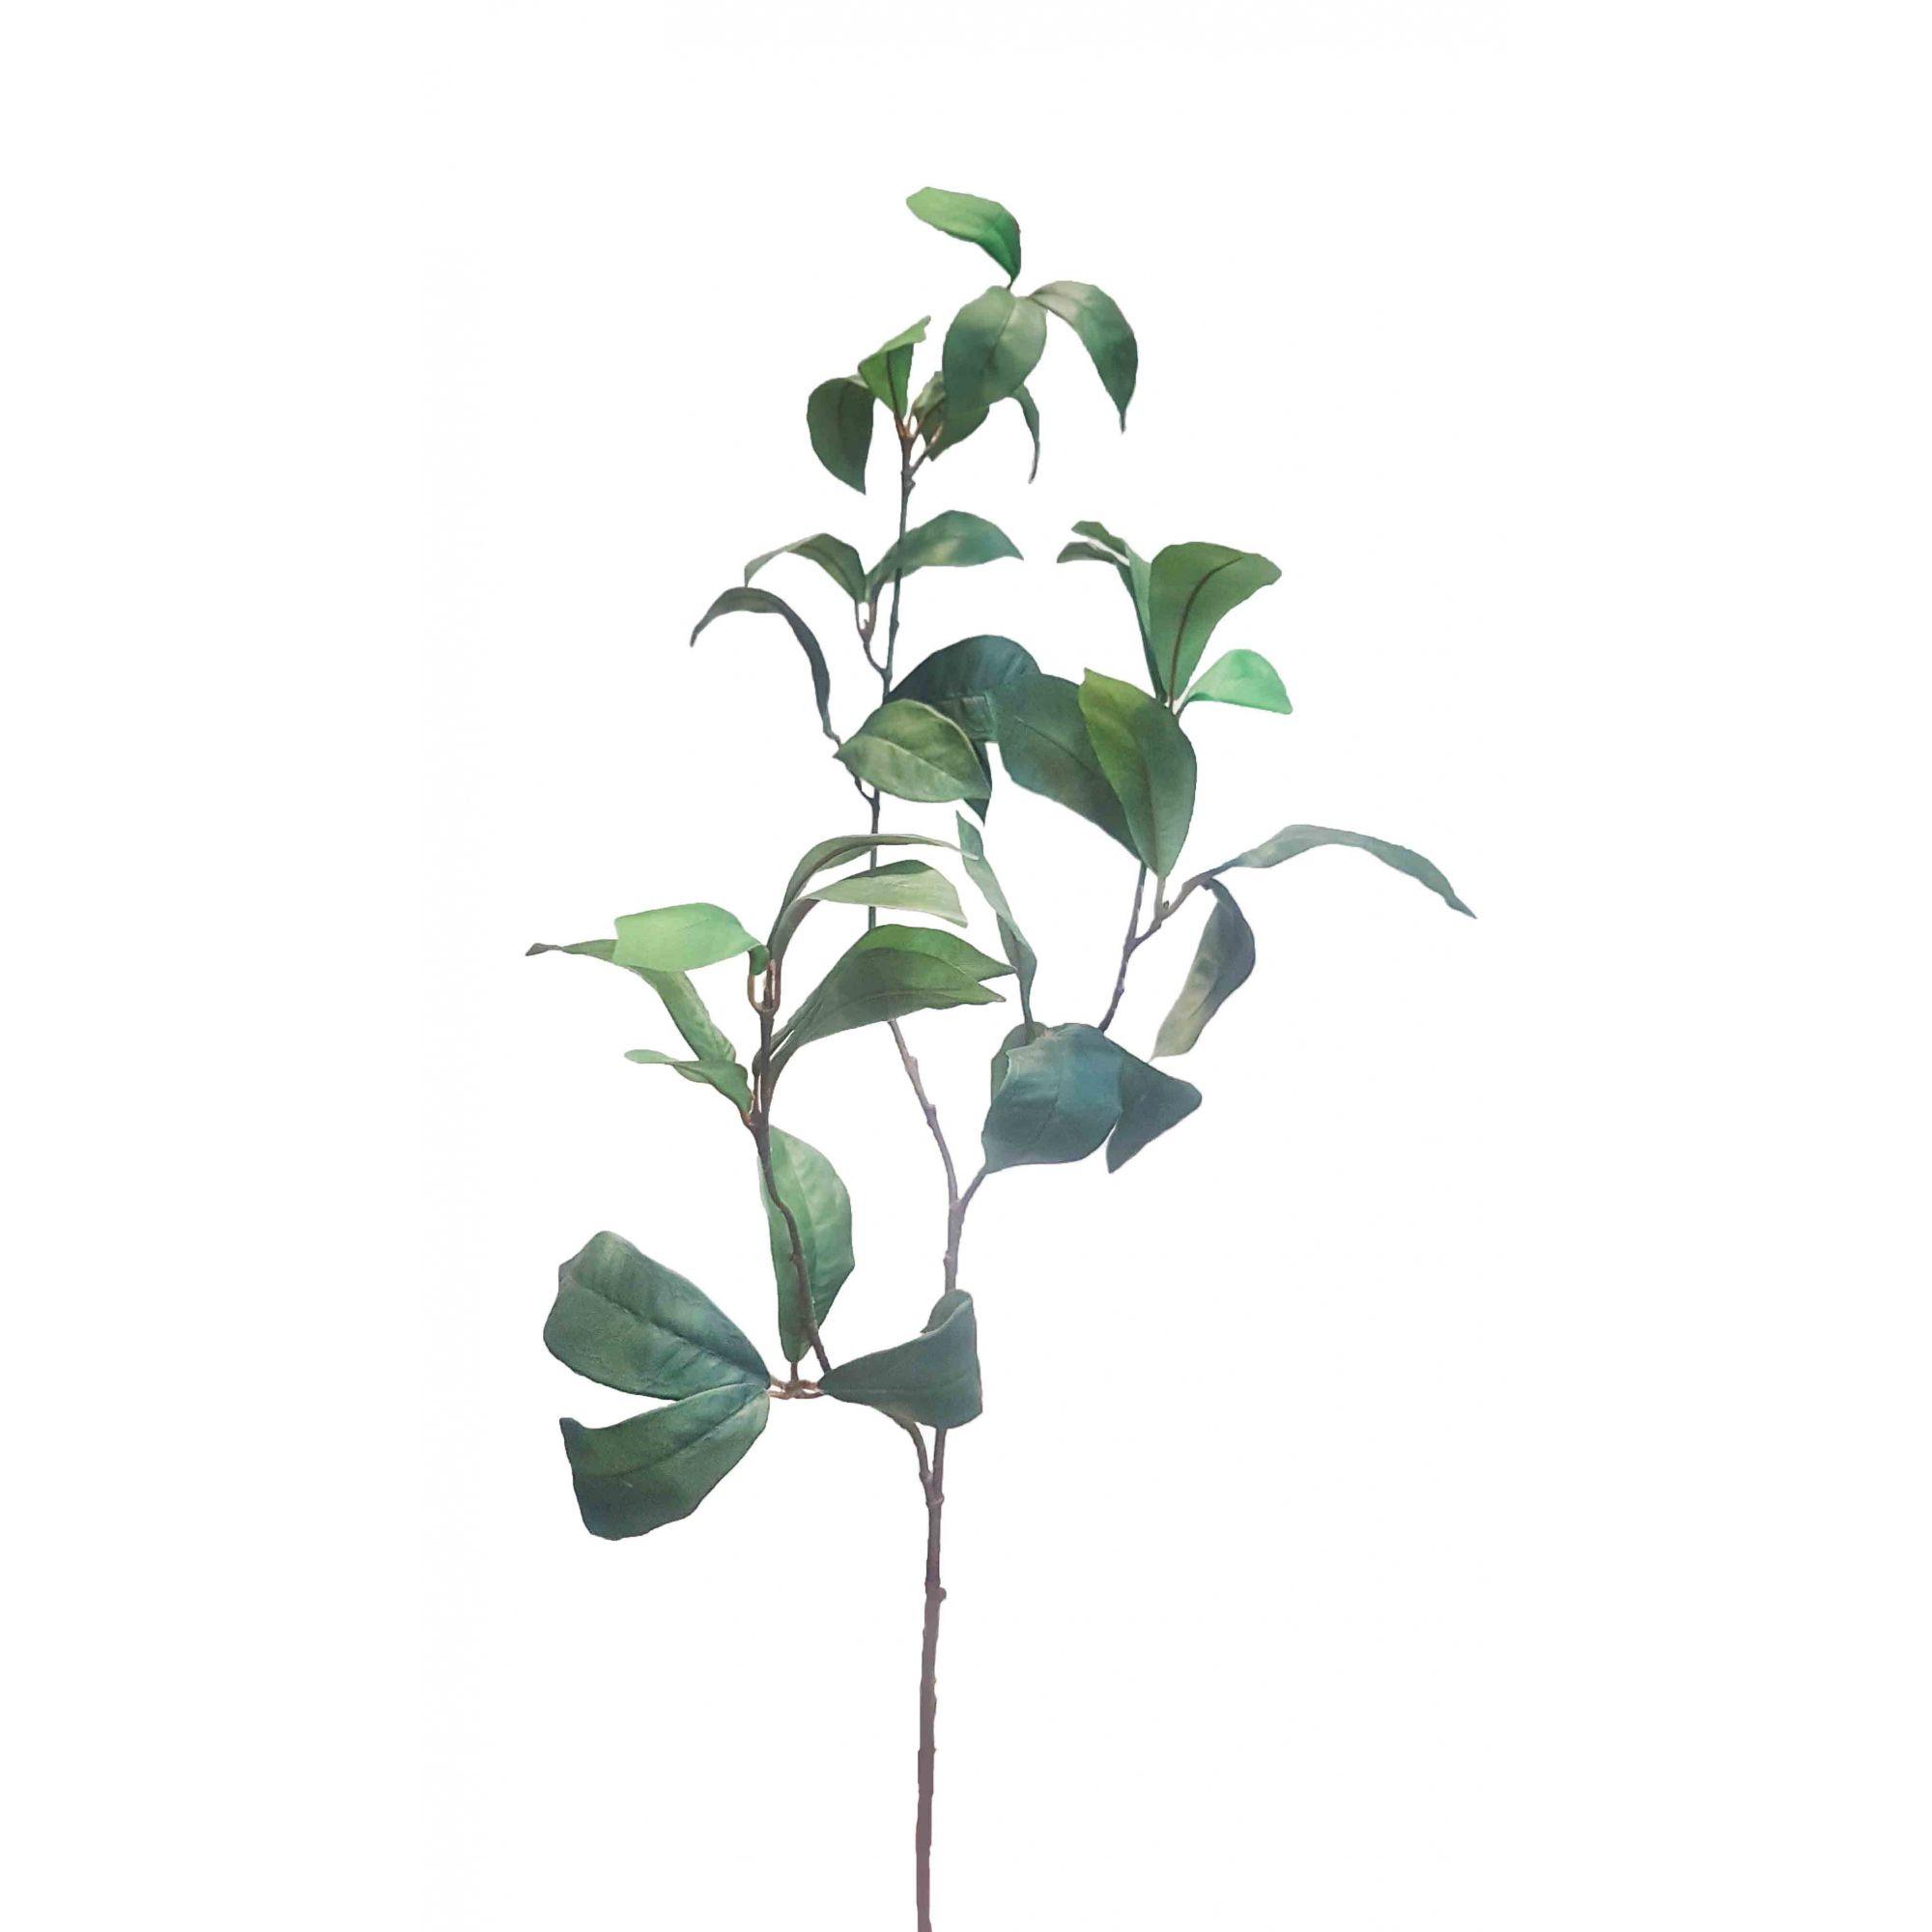 C. Folha polka x37 verde 95cm